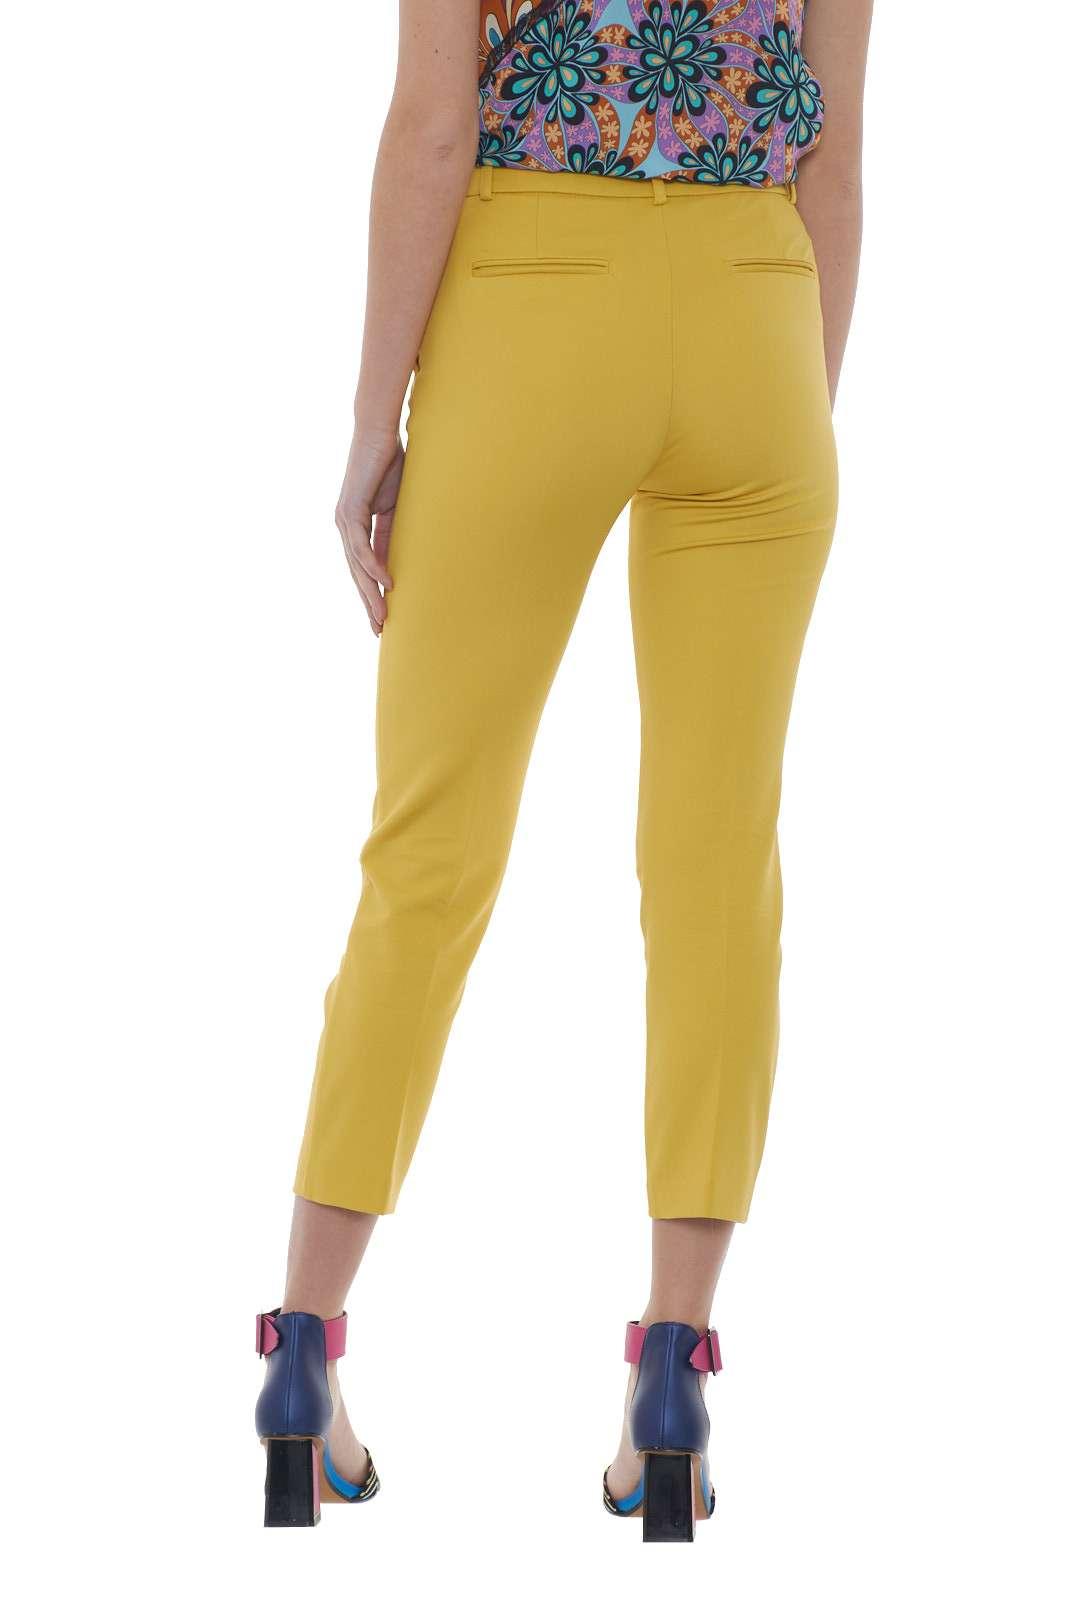 https://www.parmax.com/media/catalog/product/a/i/PE-outlet_parmax-pantaloni-donna-Pinko-1g14ts-C.jpg